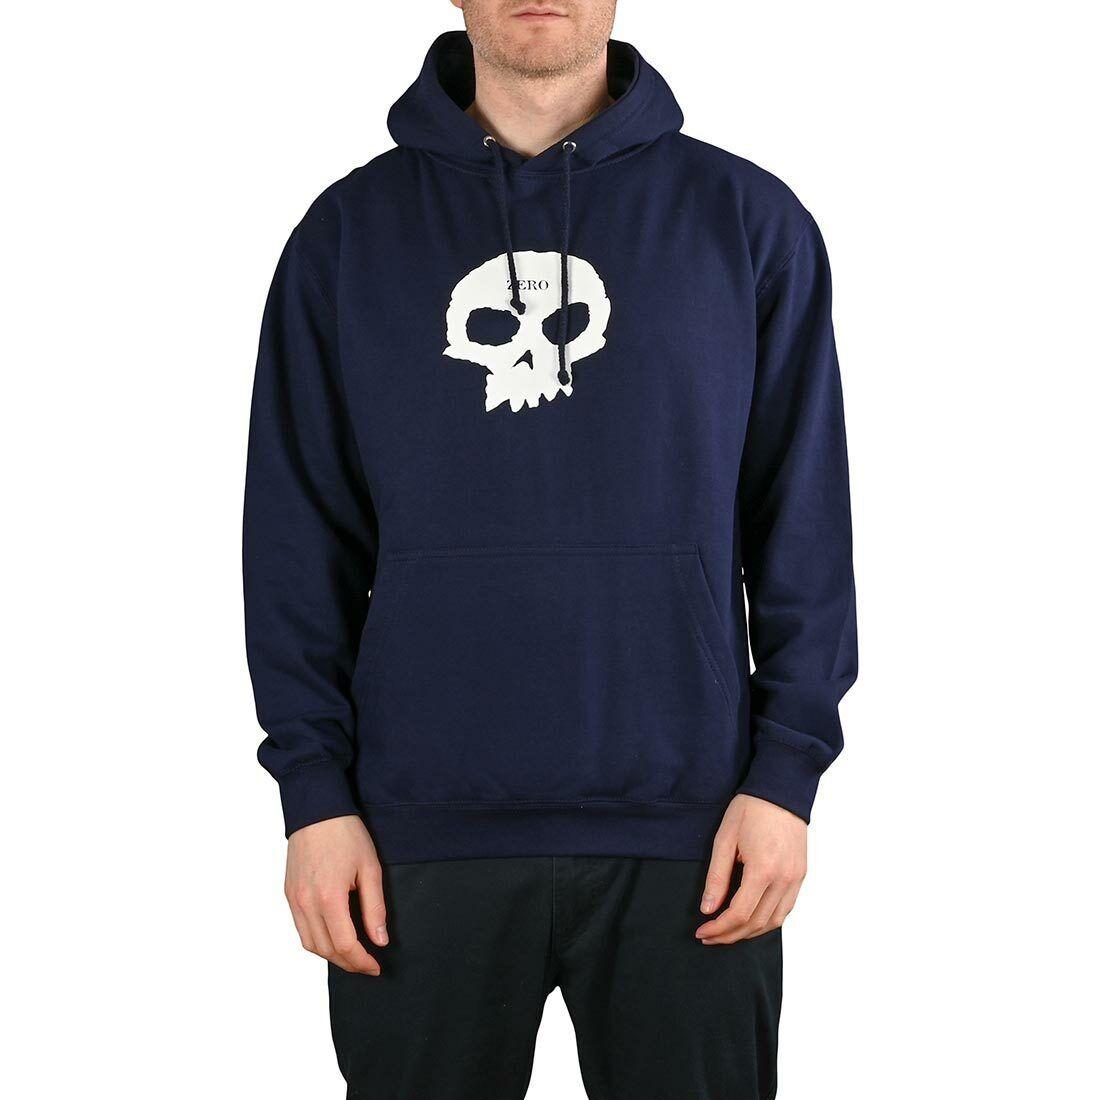 Zero Single Skull Pullover Hoodie - Navy / White